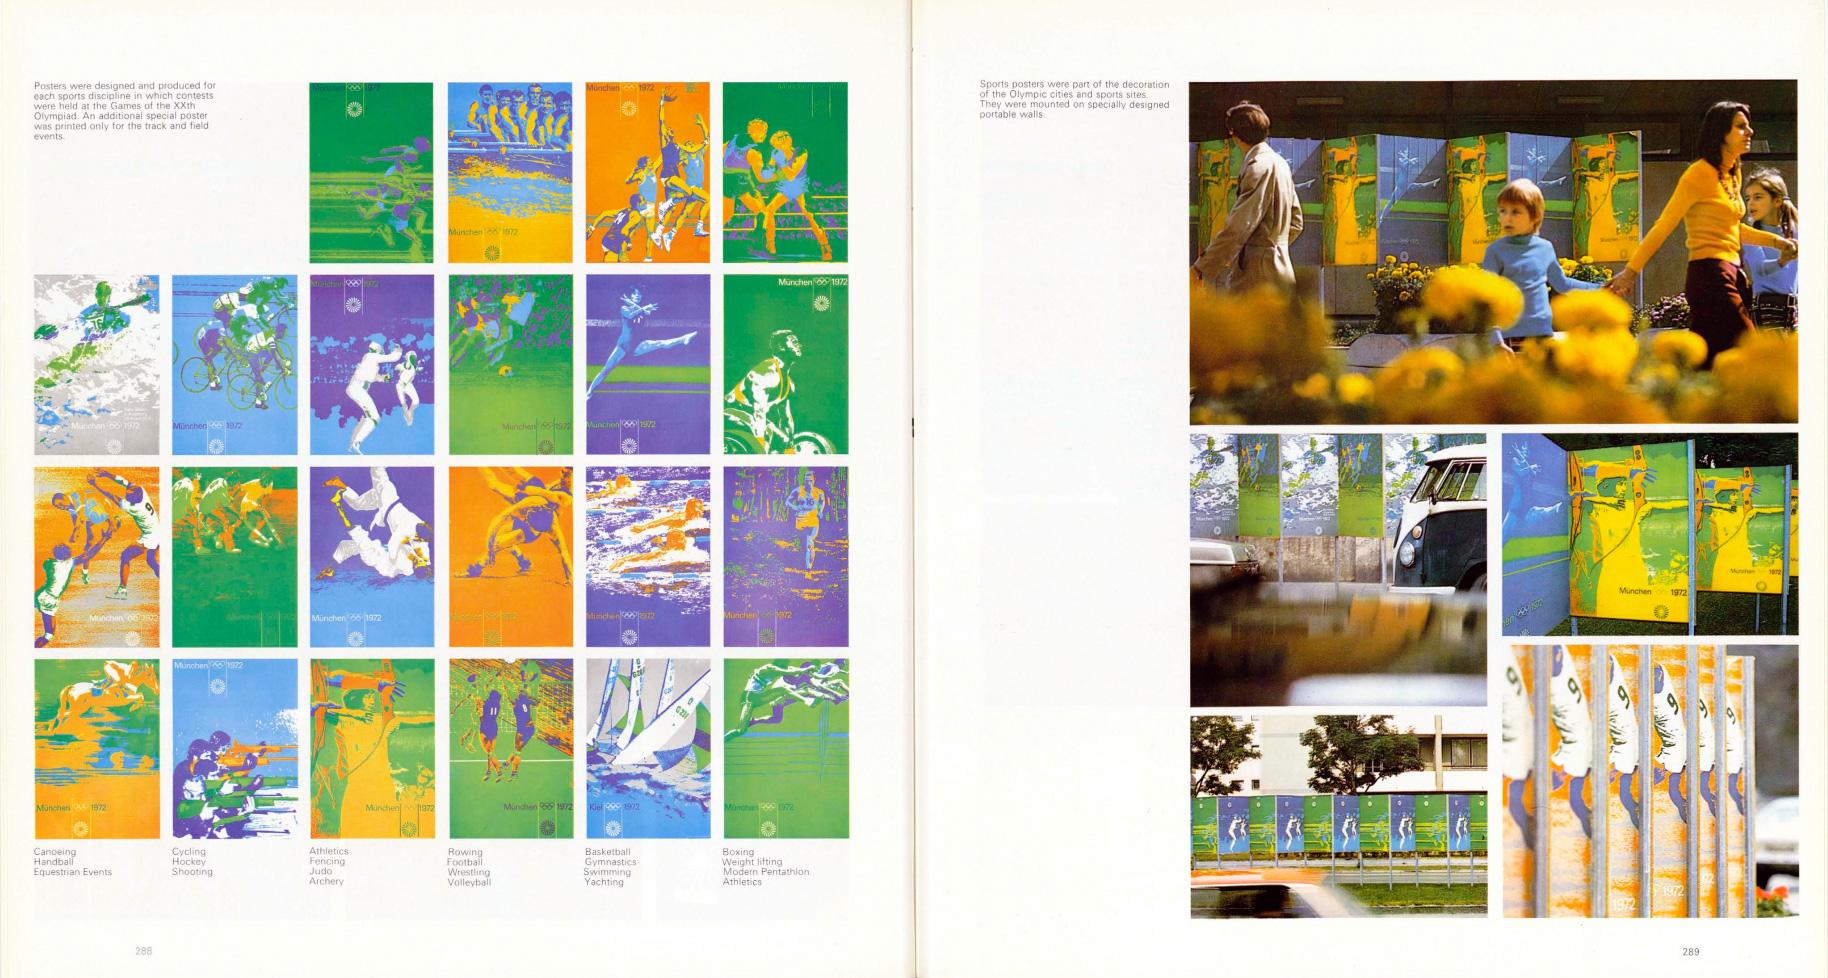 buchstabenplus_olympia1972